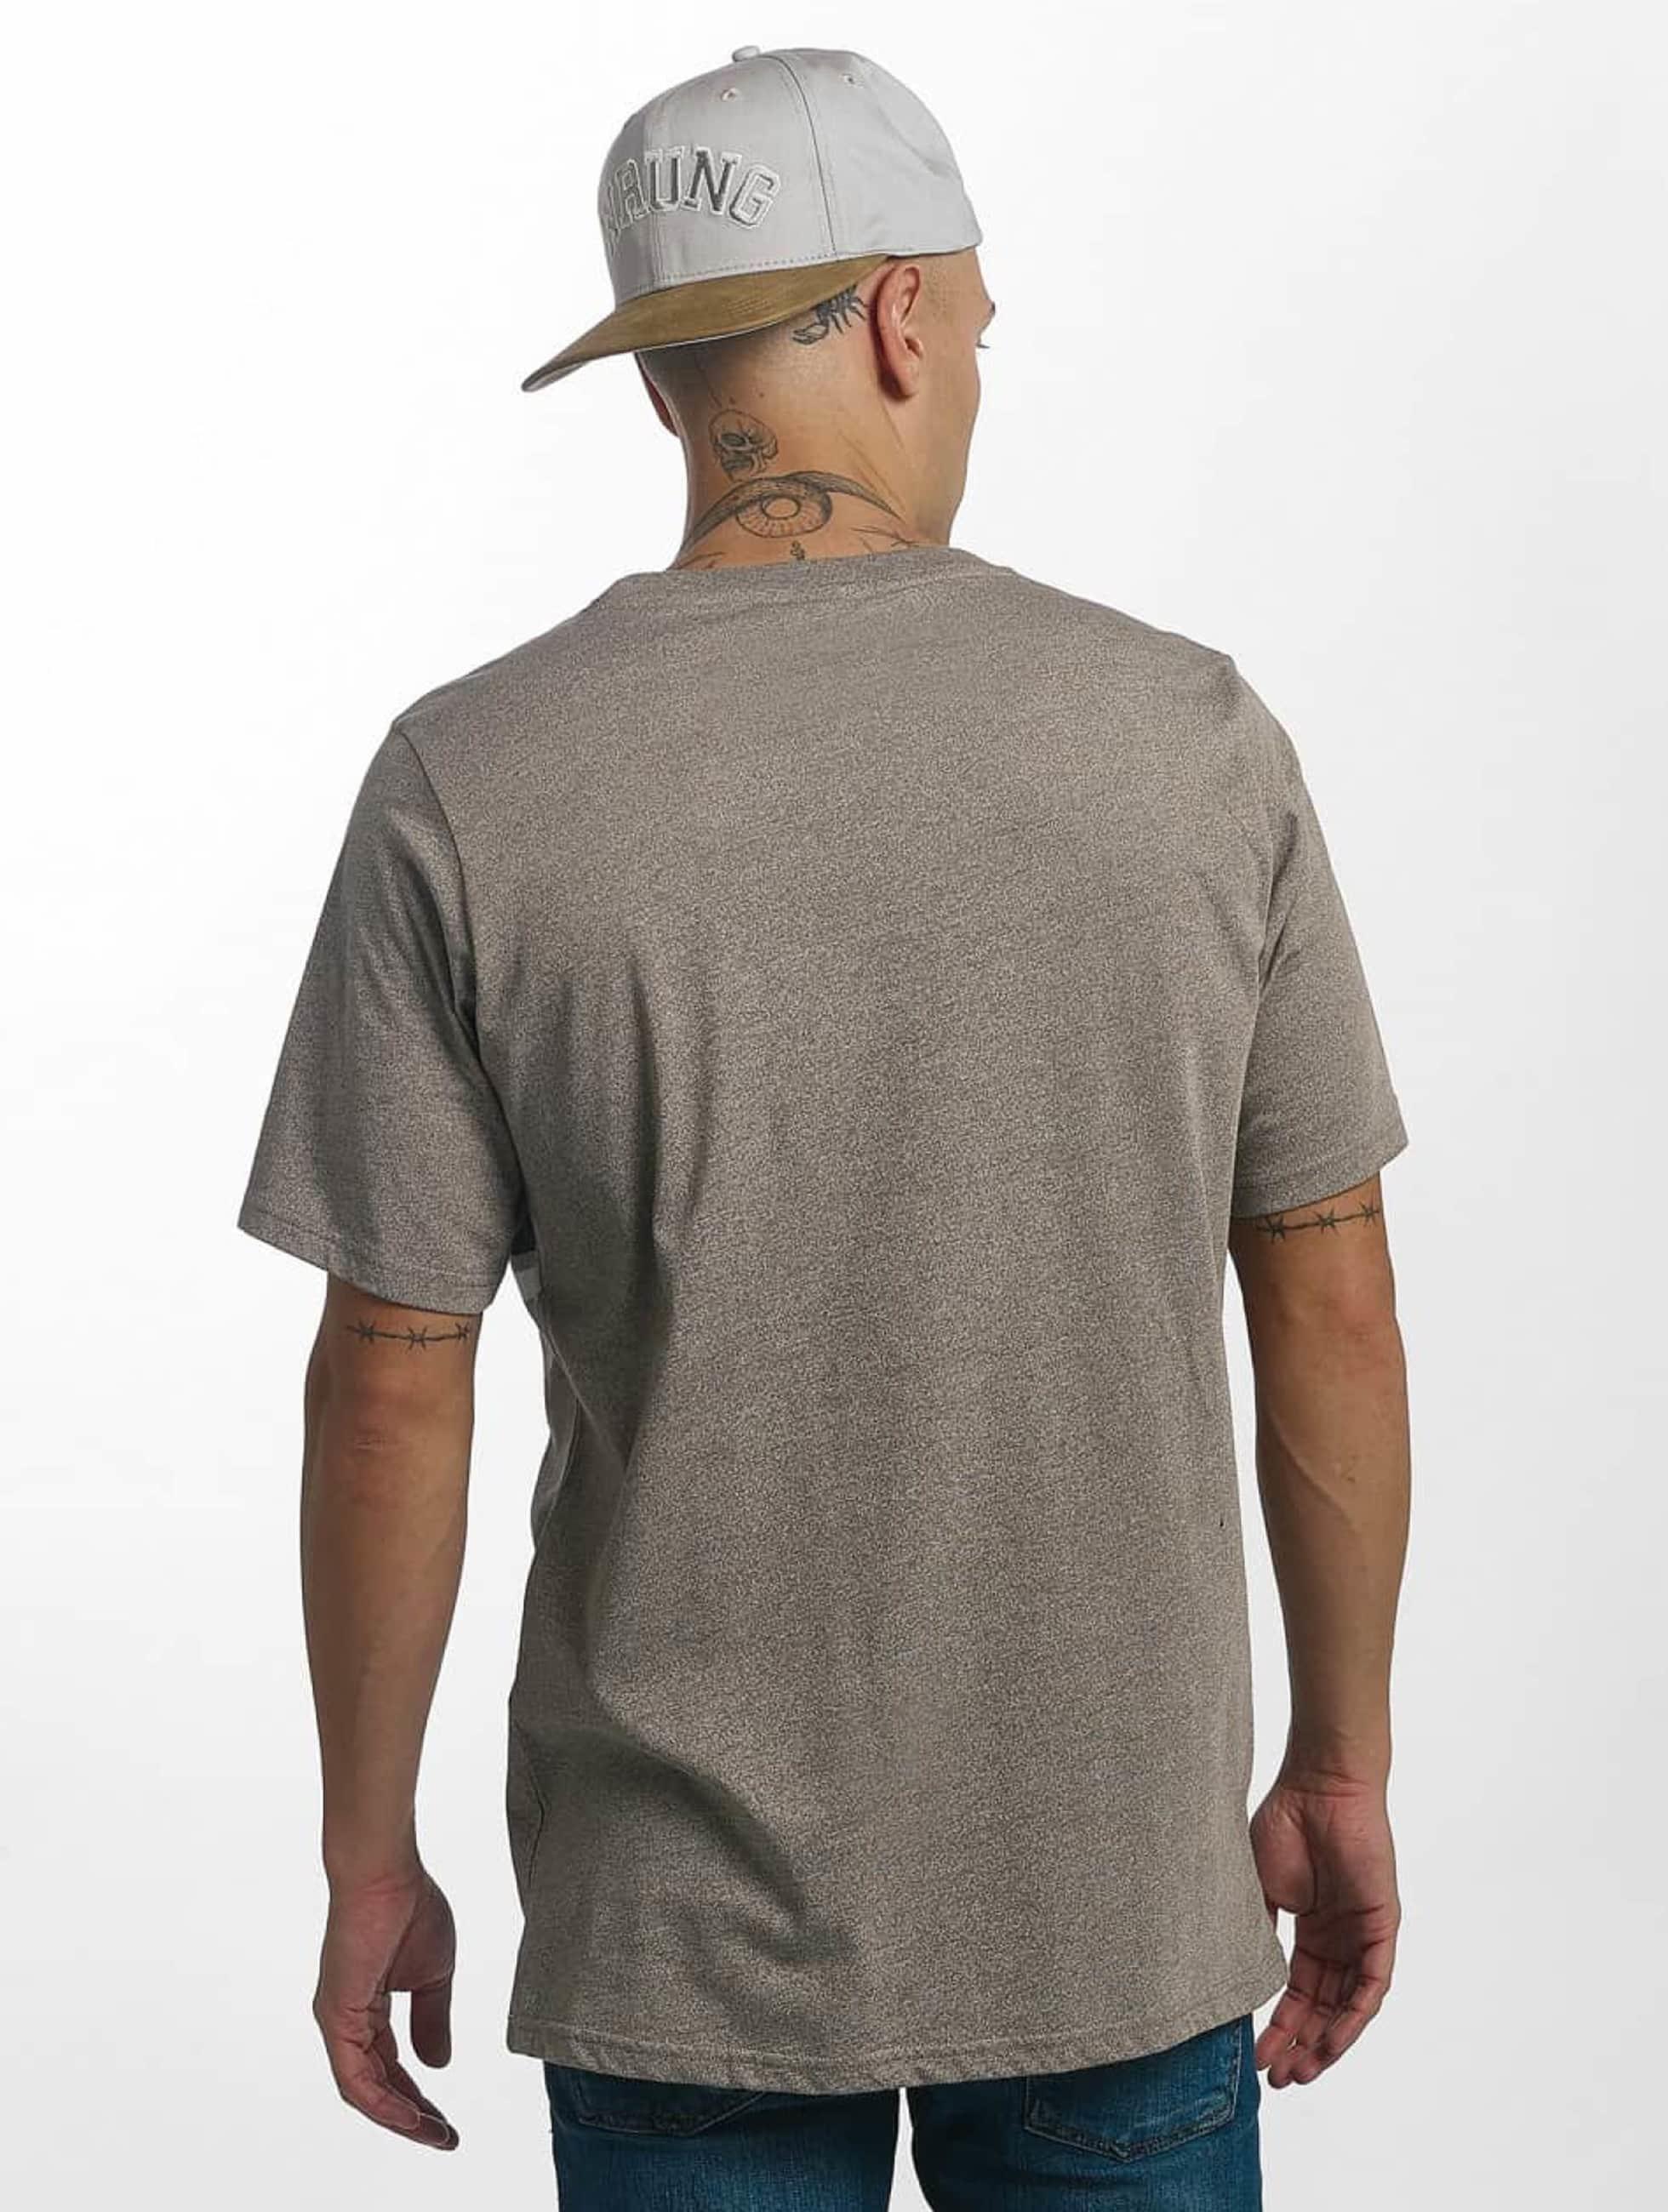 Wrung Division T-shirt Show grigio